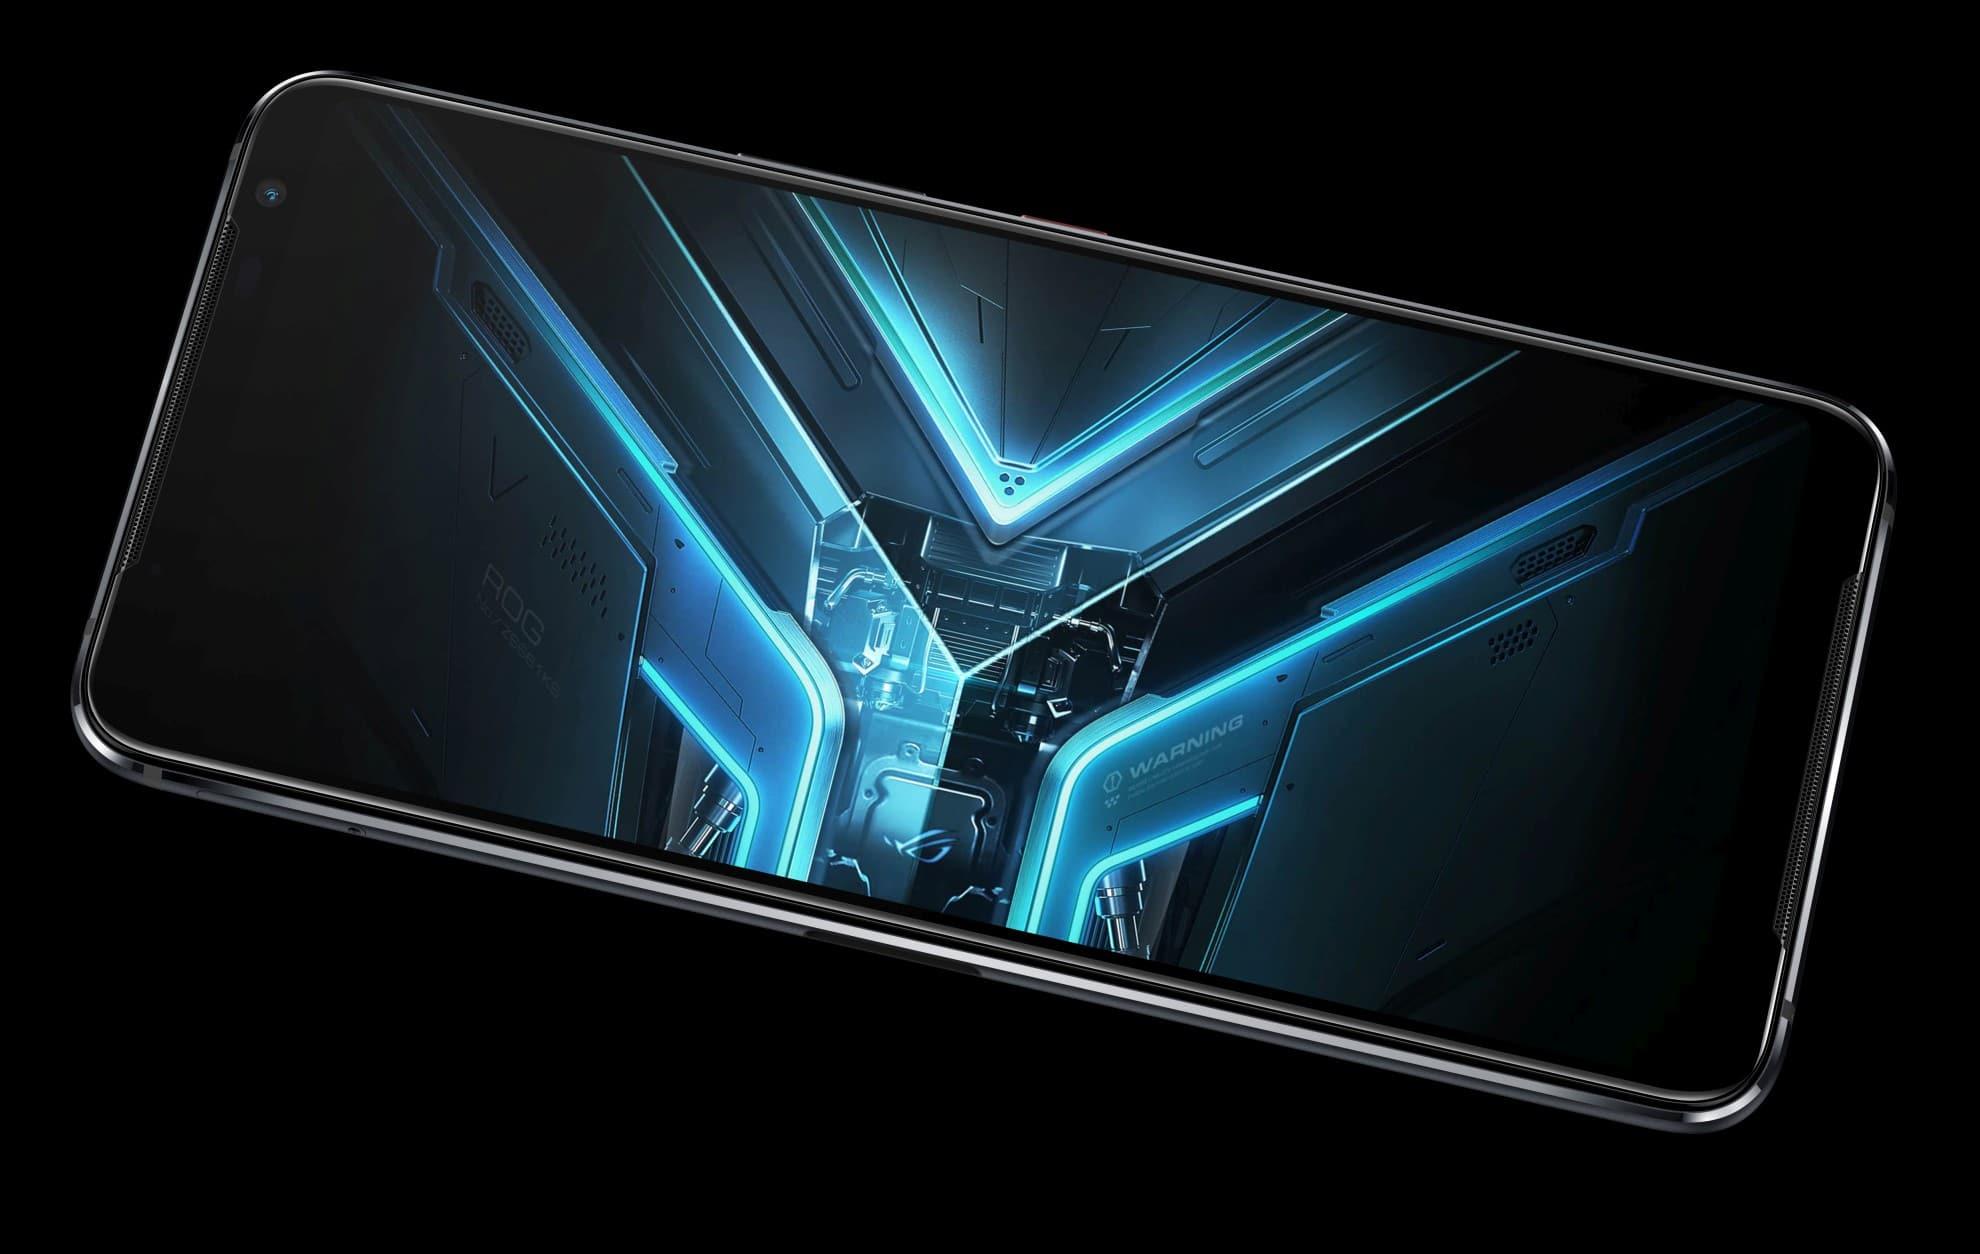 Das neue Asus ROG Phone III ist stark. (Foto: Asus)